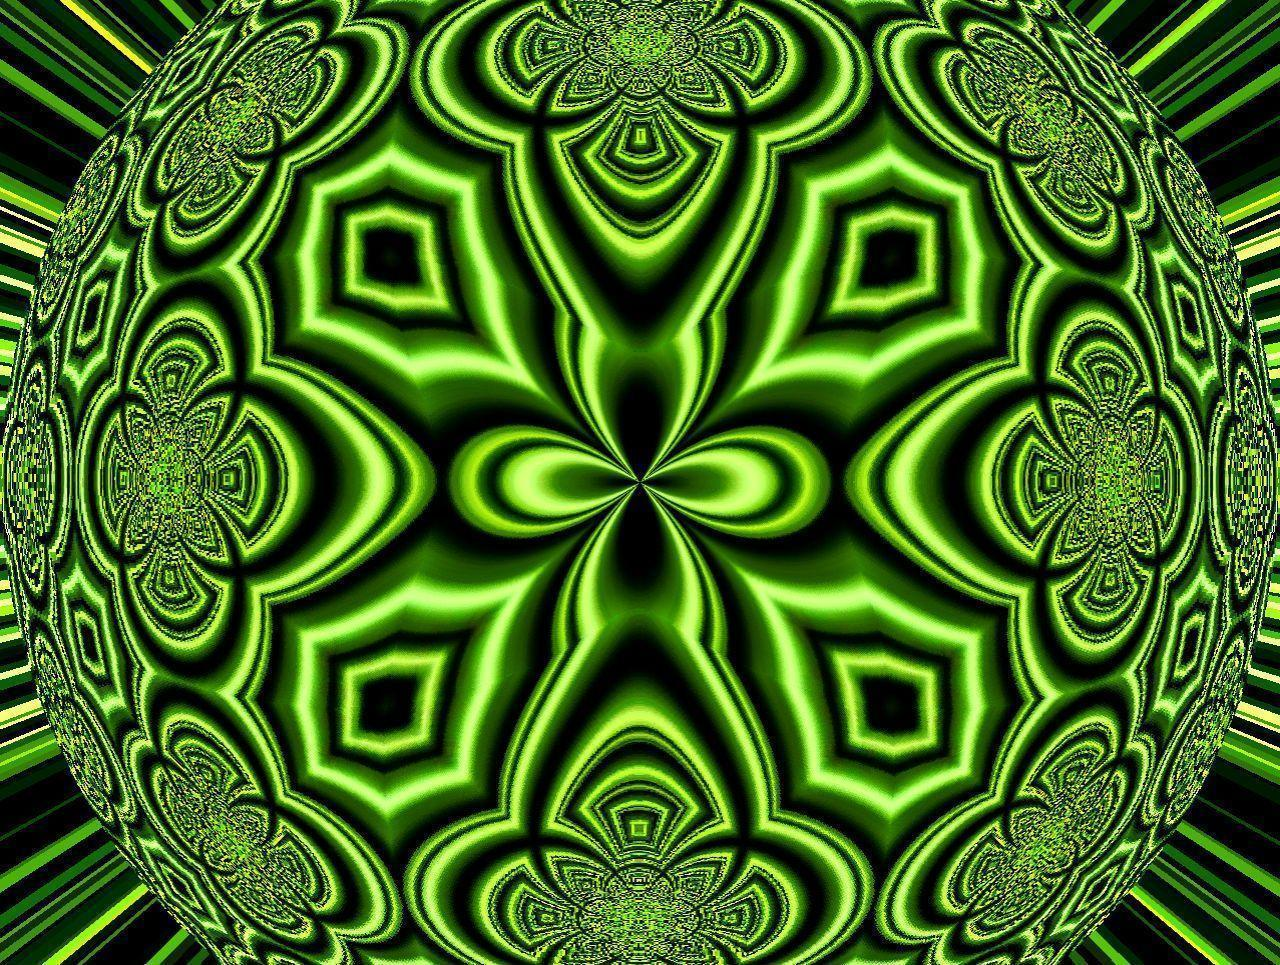 Celtic Cross Wallpapers 1280x965